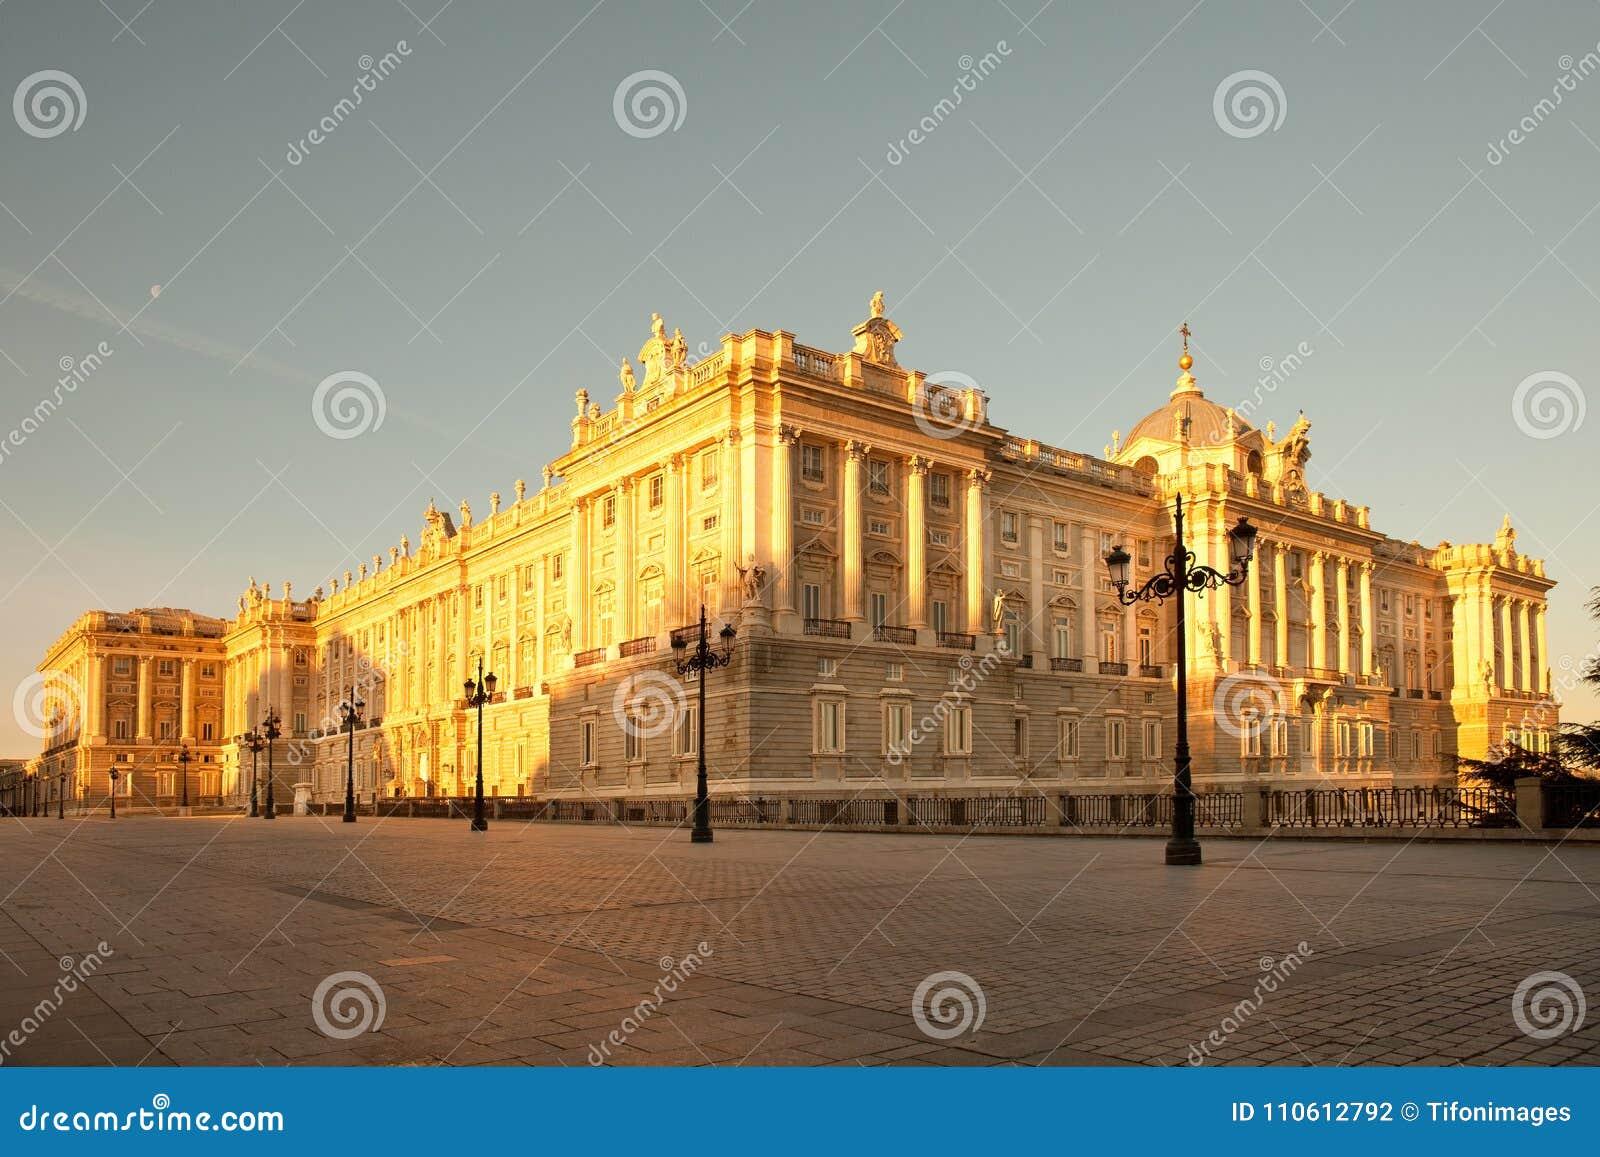 Palacio Real Royal Palace At Plaza De Oriente In Madrid Stock Photo